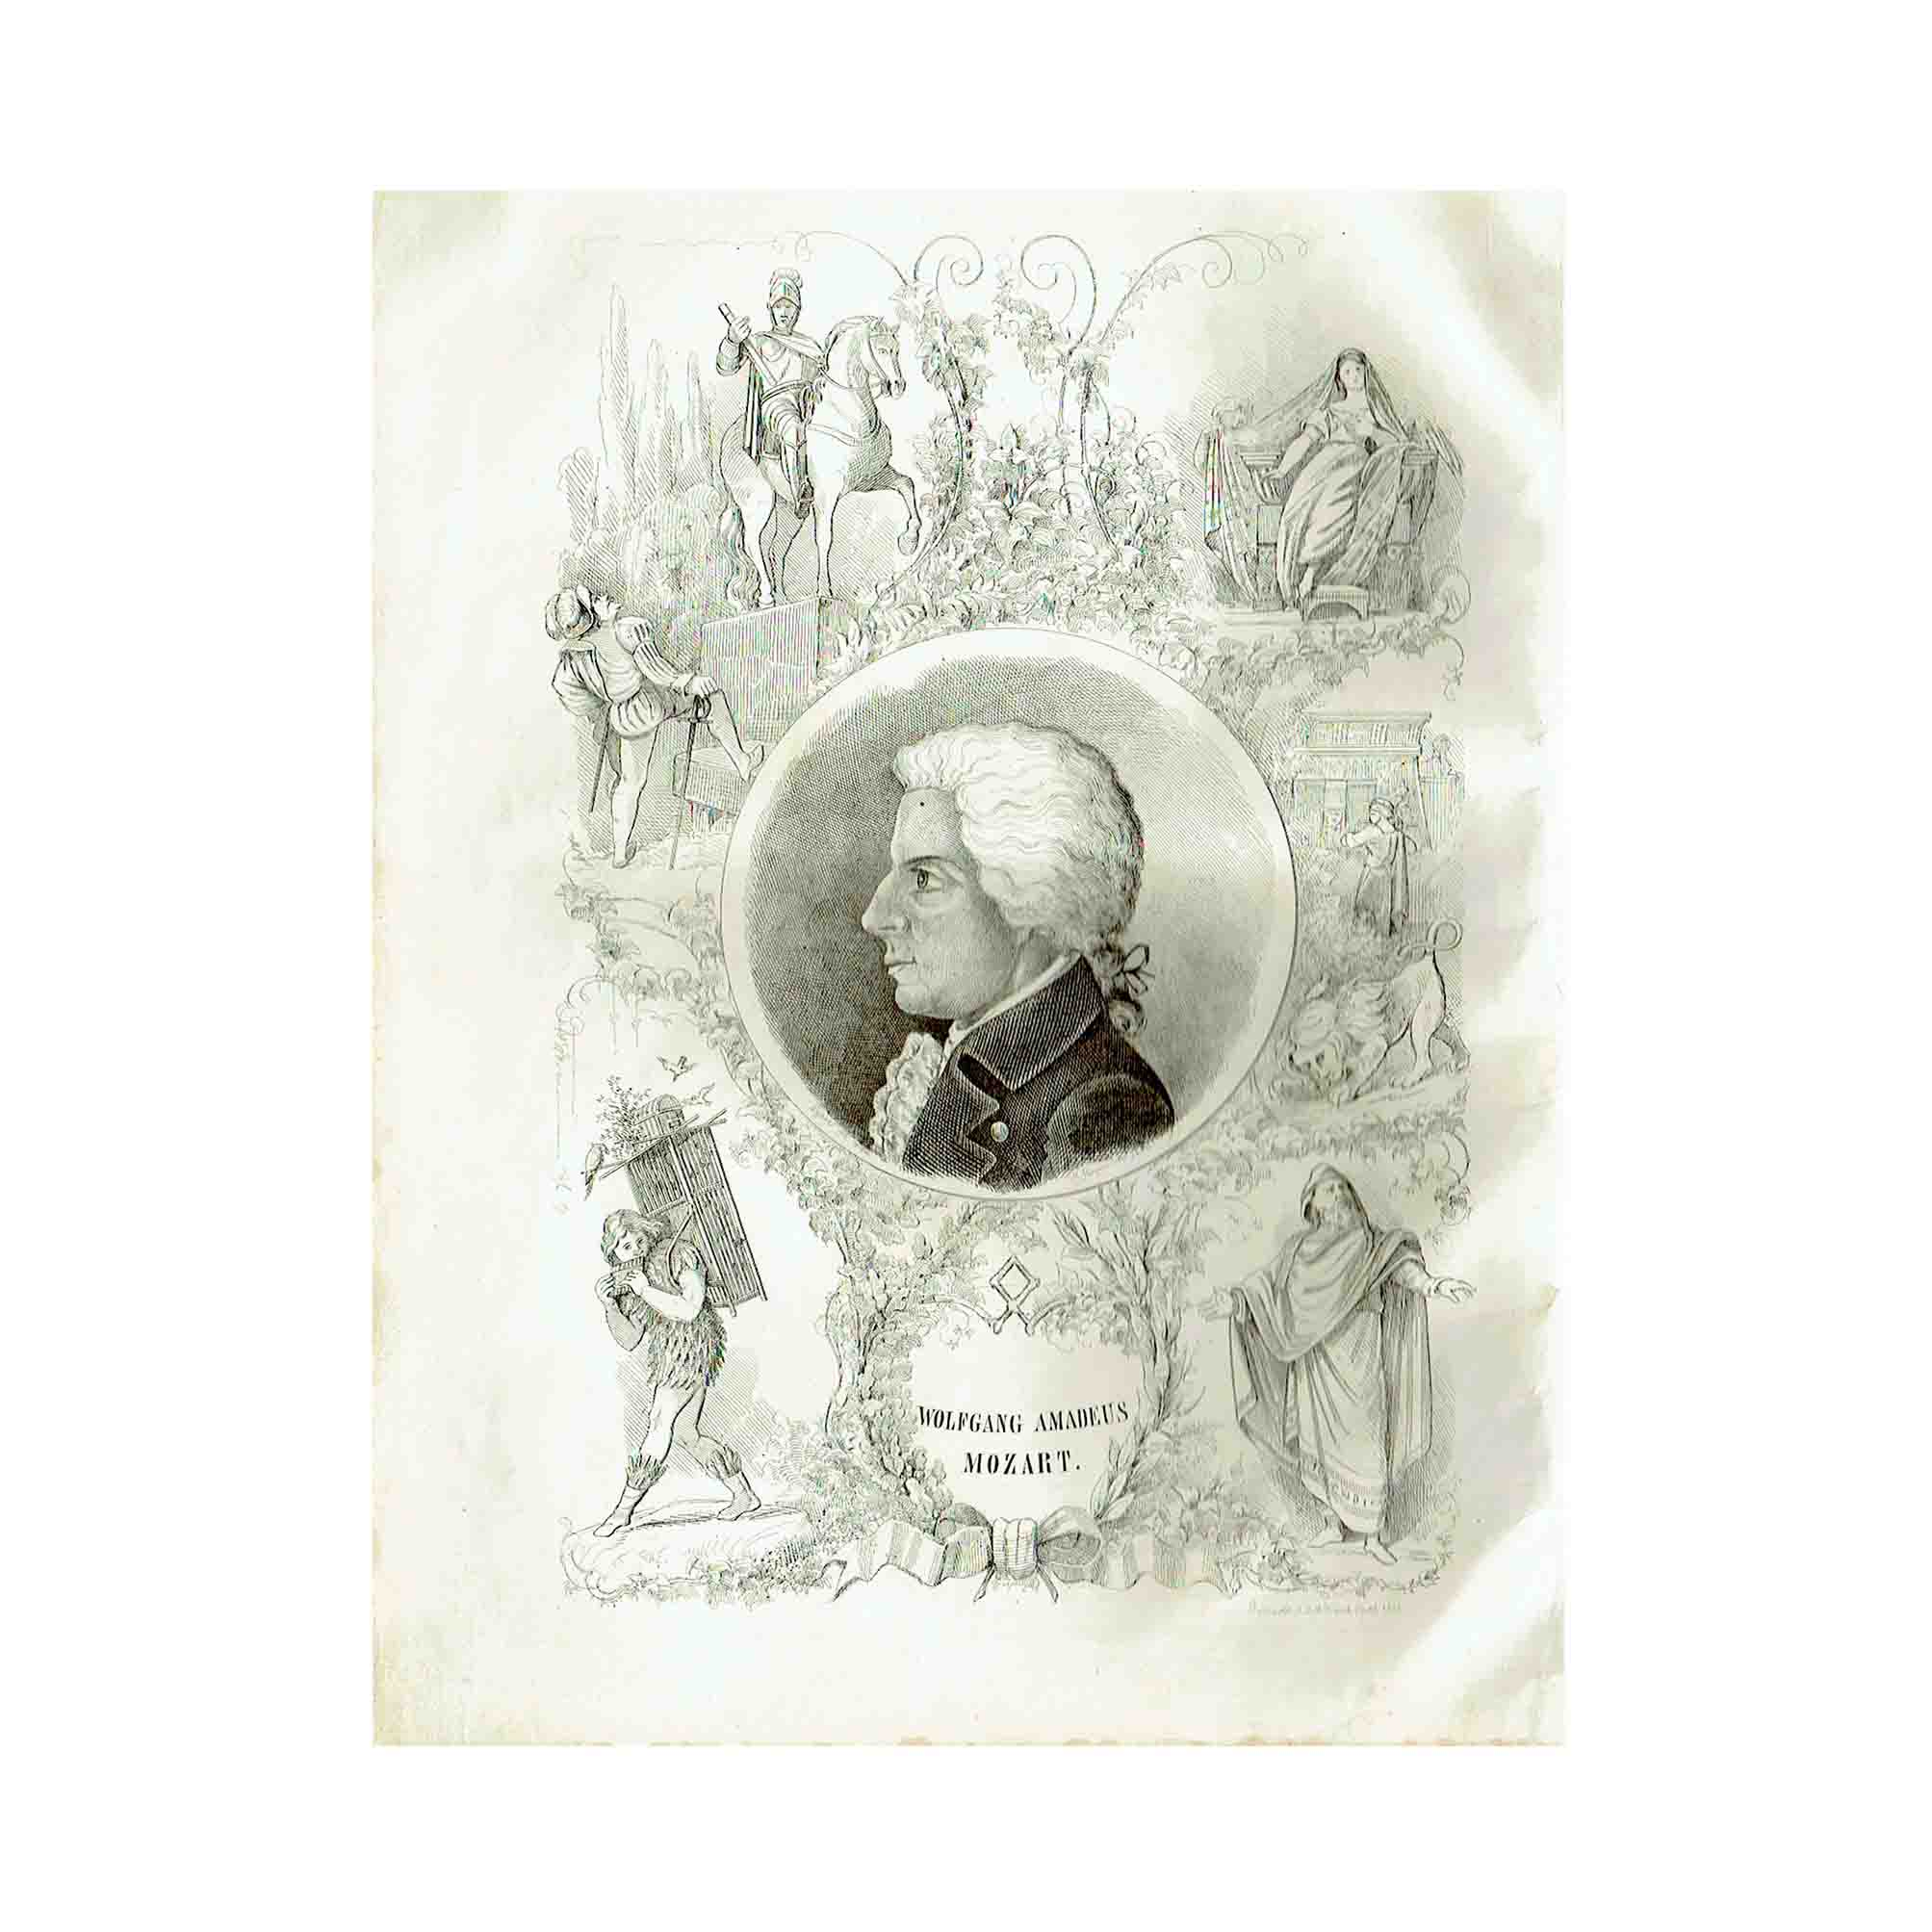 5805-Mozart-Kayser-Commemorative-Album-1856-Portrait-Mozart-N.jpeg